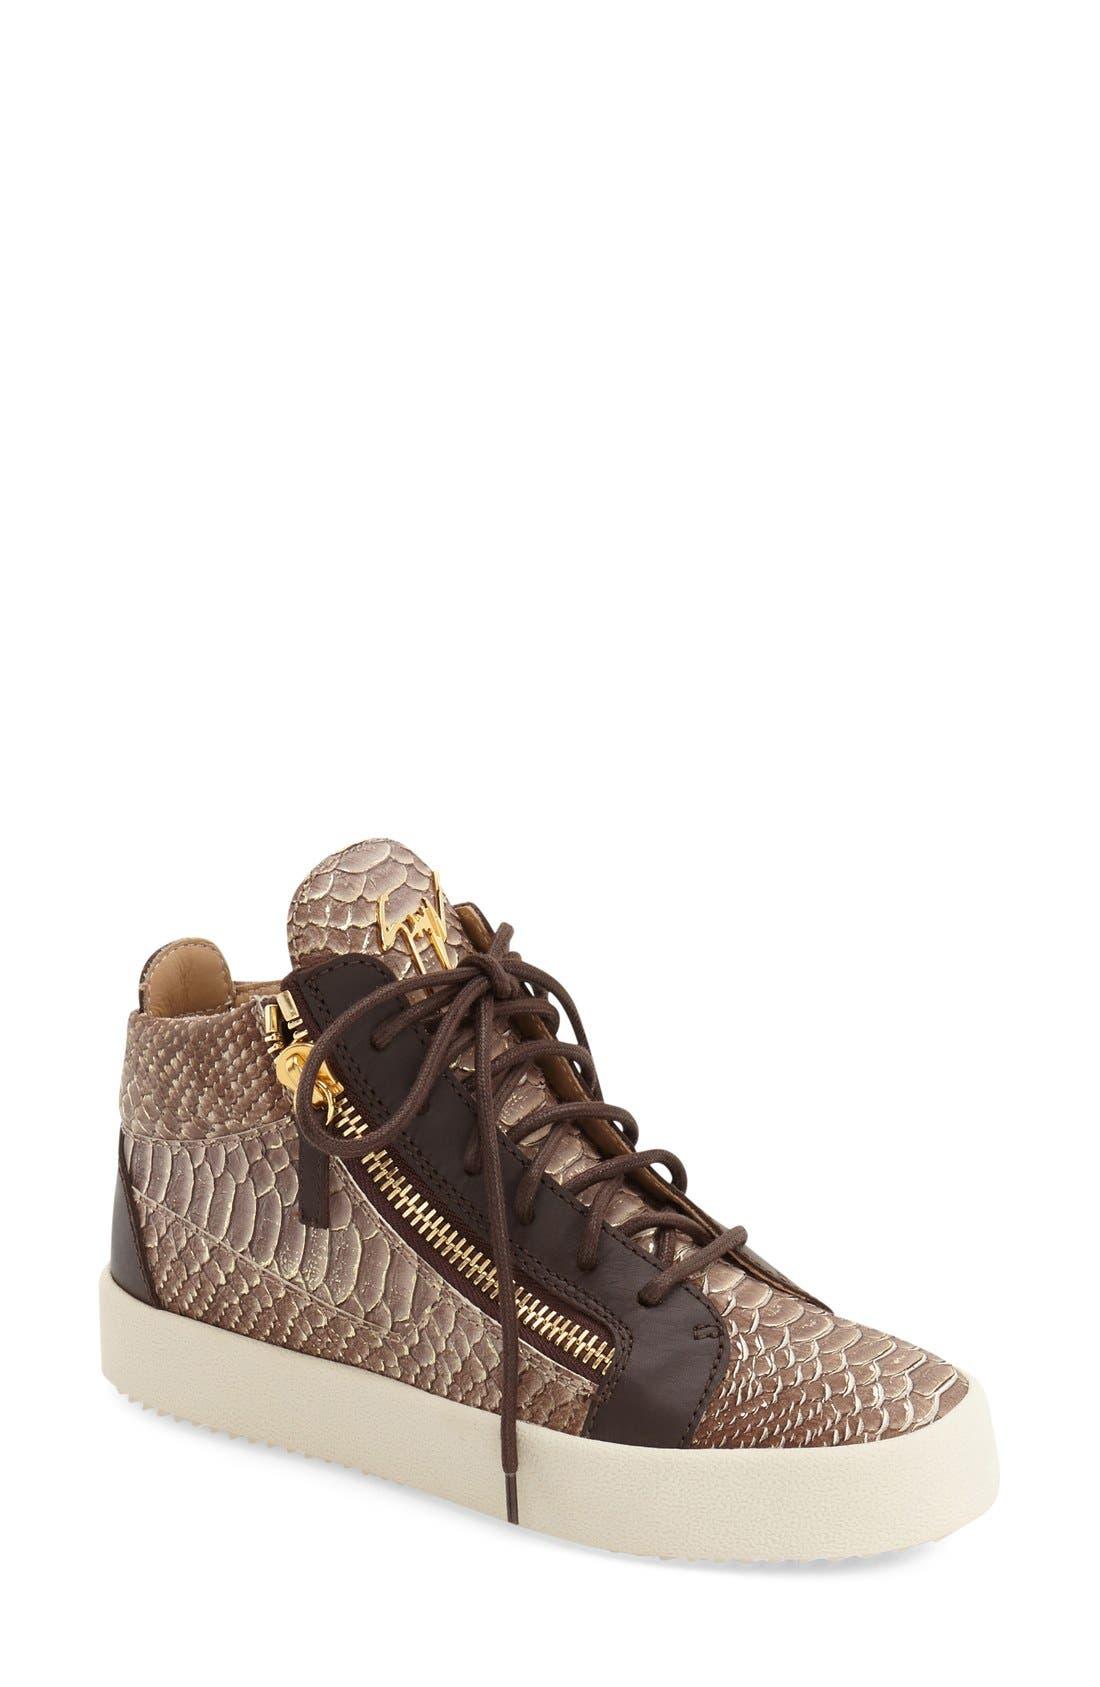 GIUSEPPE ZANOTTI 'May London' High Top Sneaker